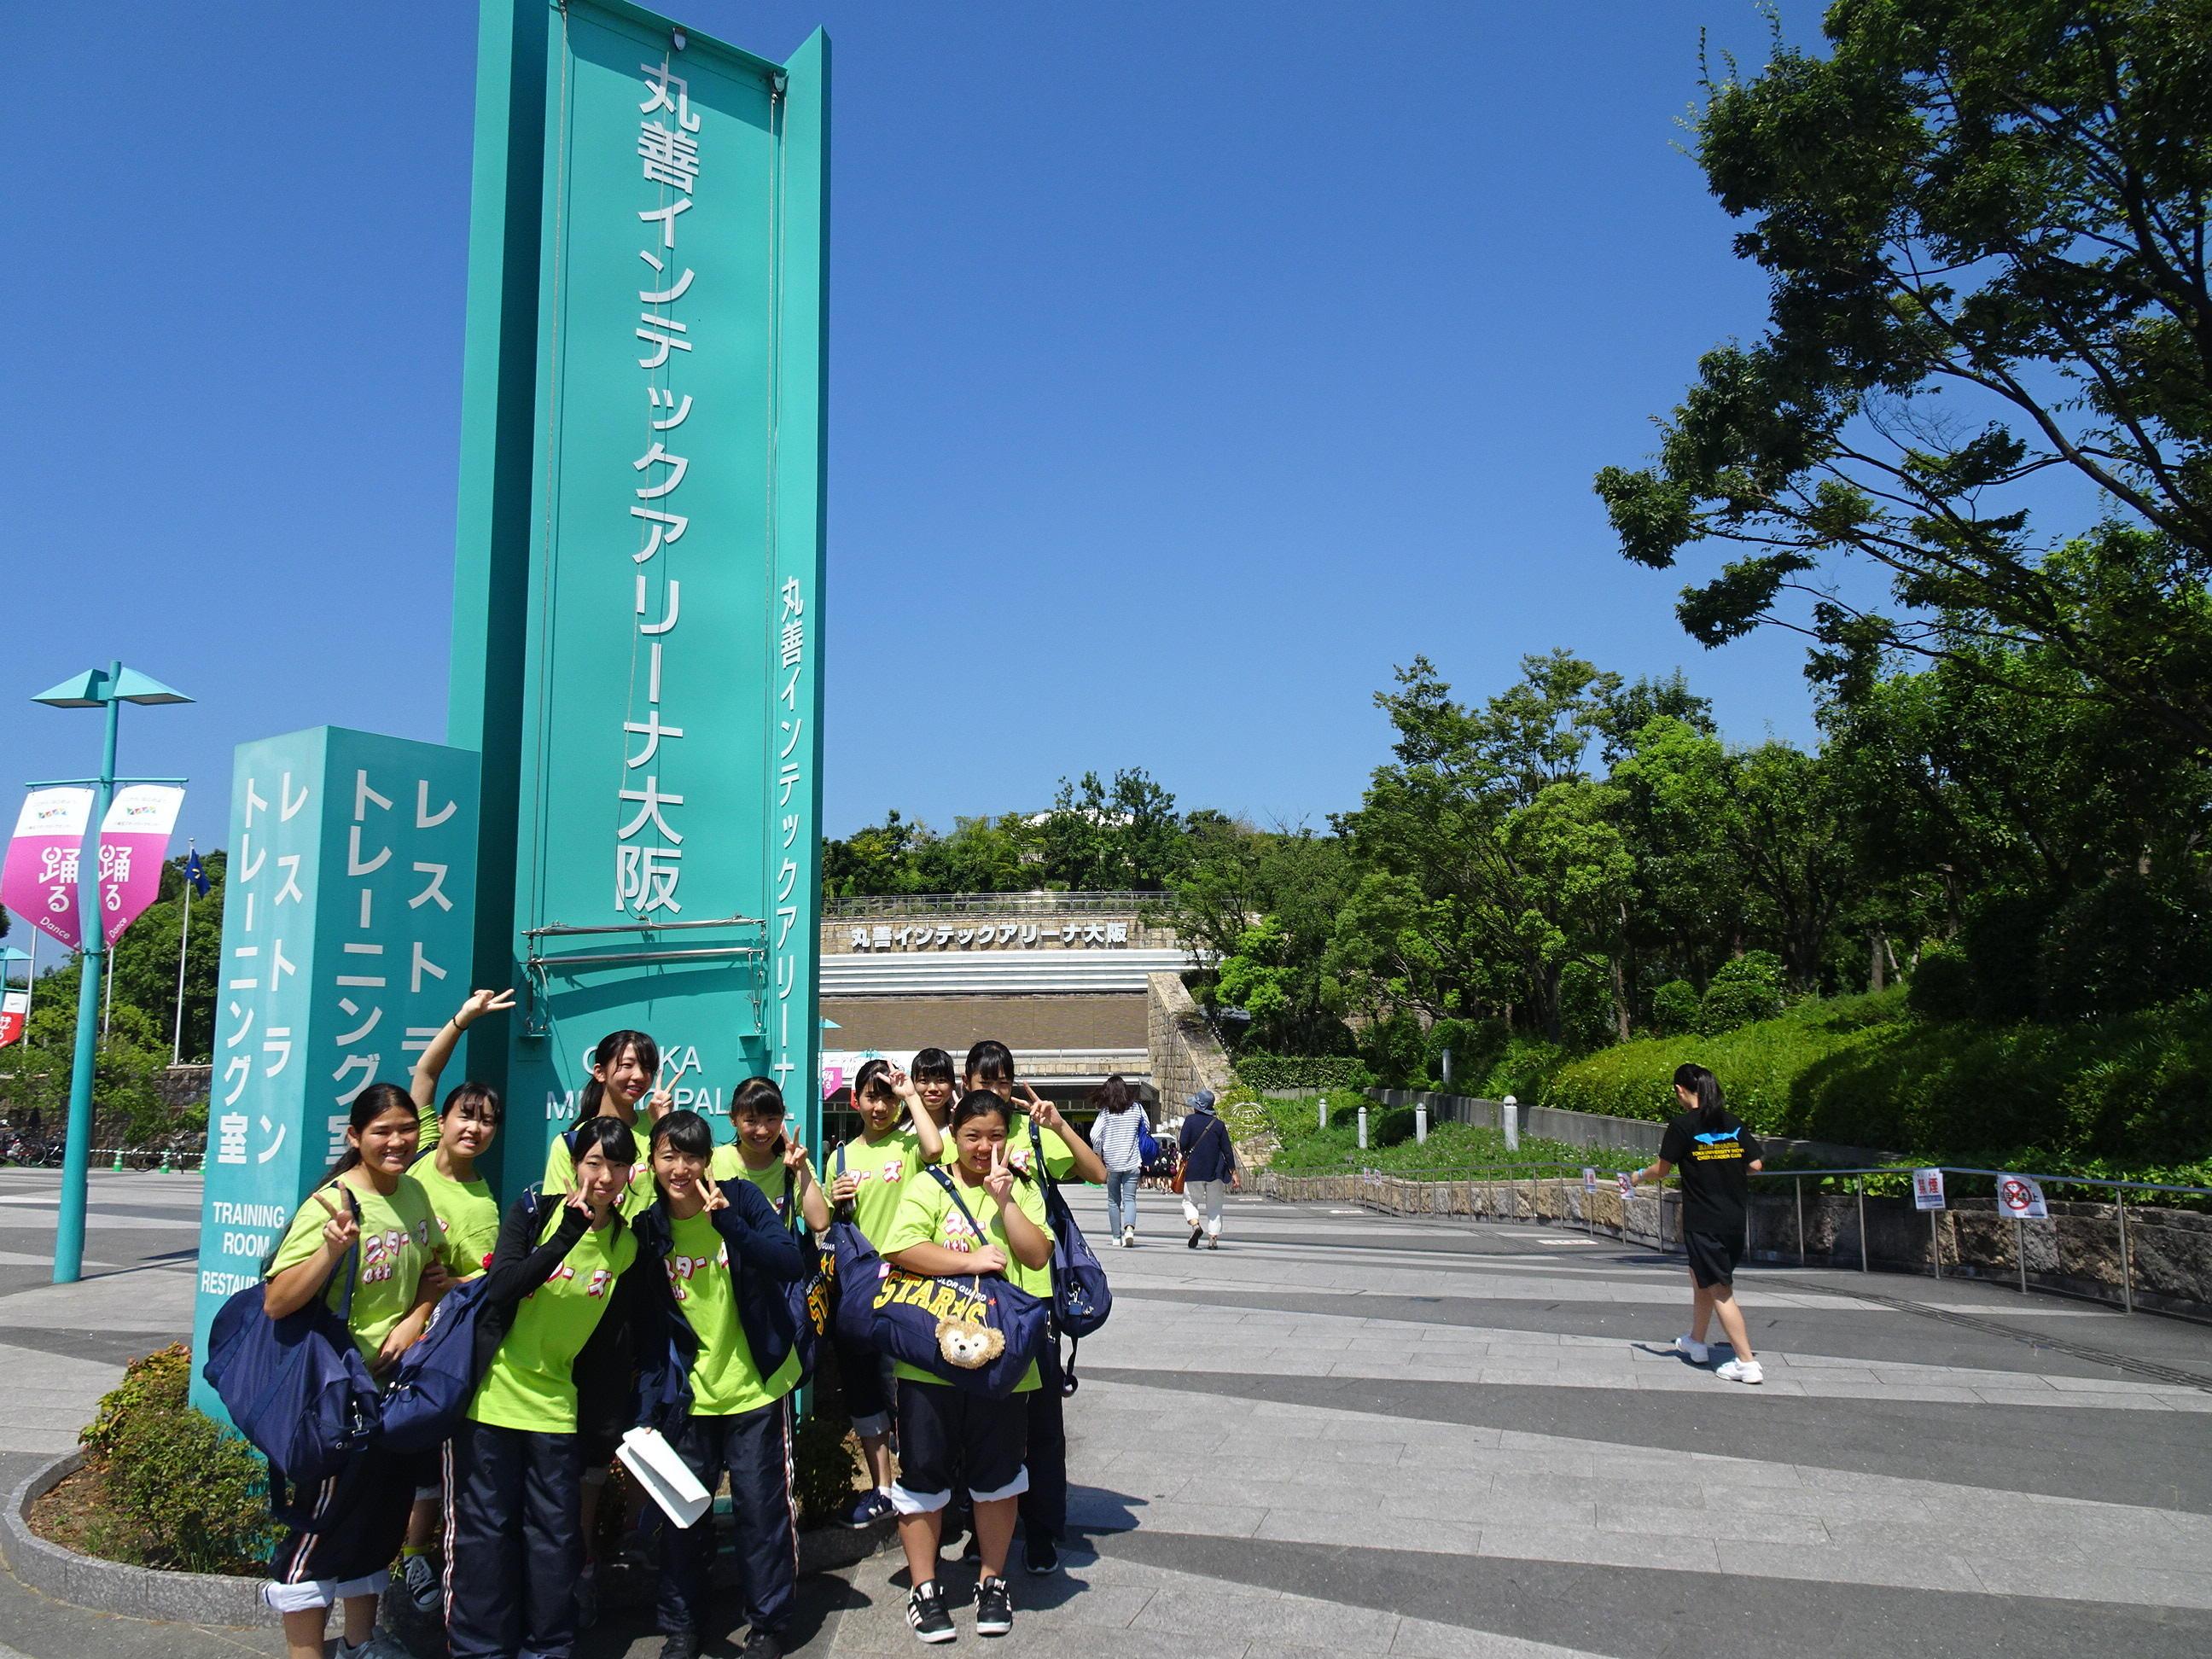 180801 In Osaka 1st (77).JPG